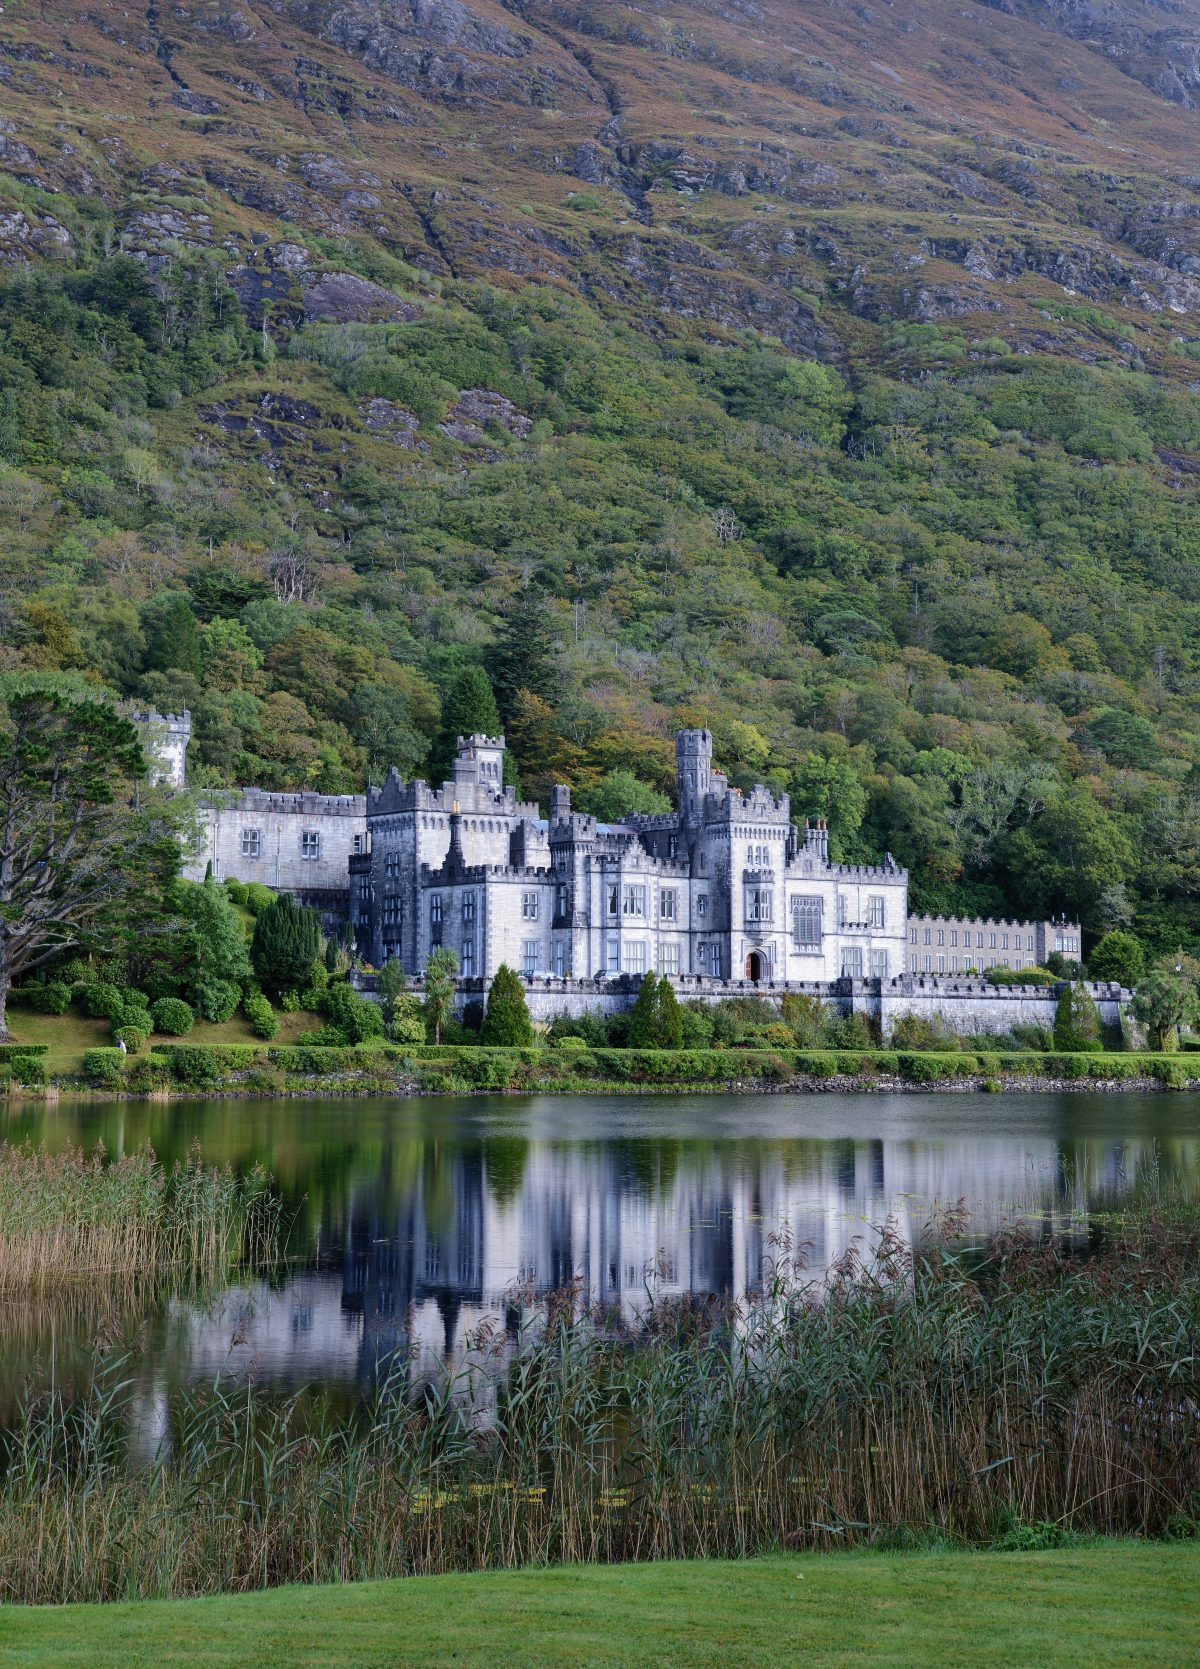 Kylemore abbey Alvesgaspar Wikipedia Commons - 10 Castles That You Should Visit In Ireland